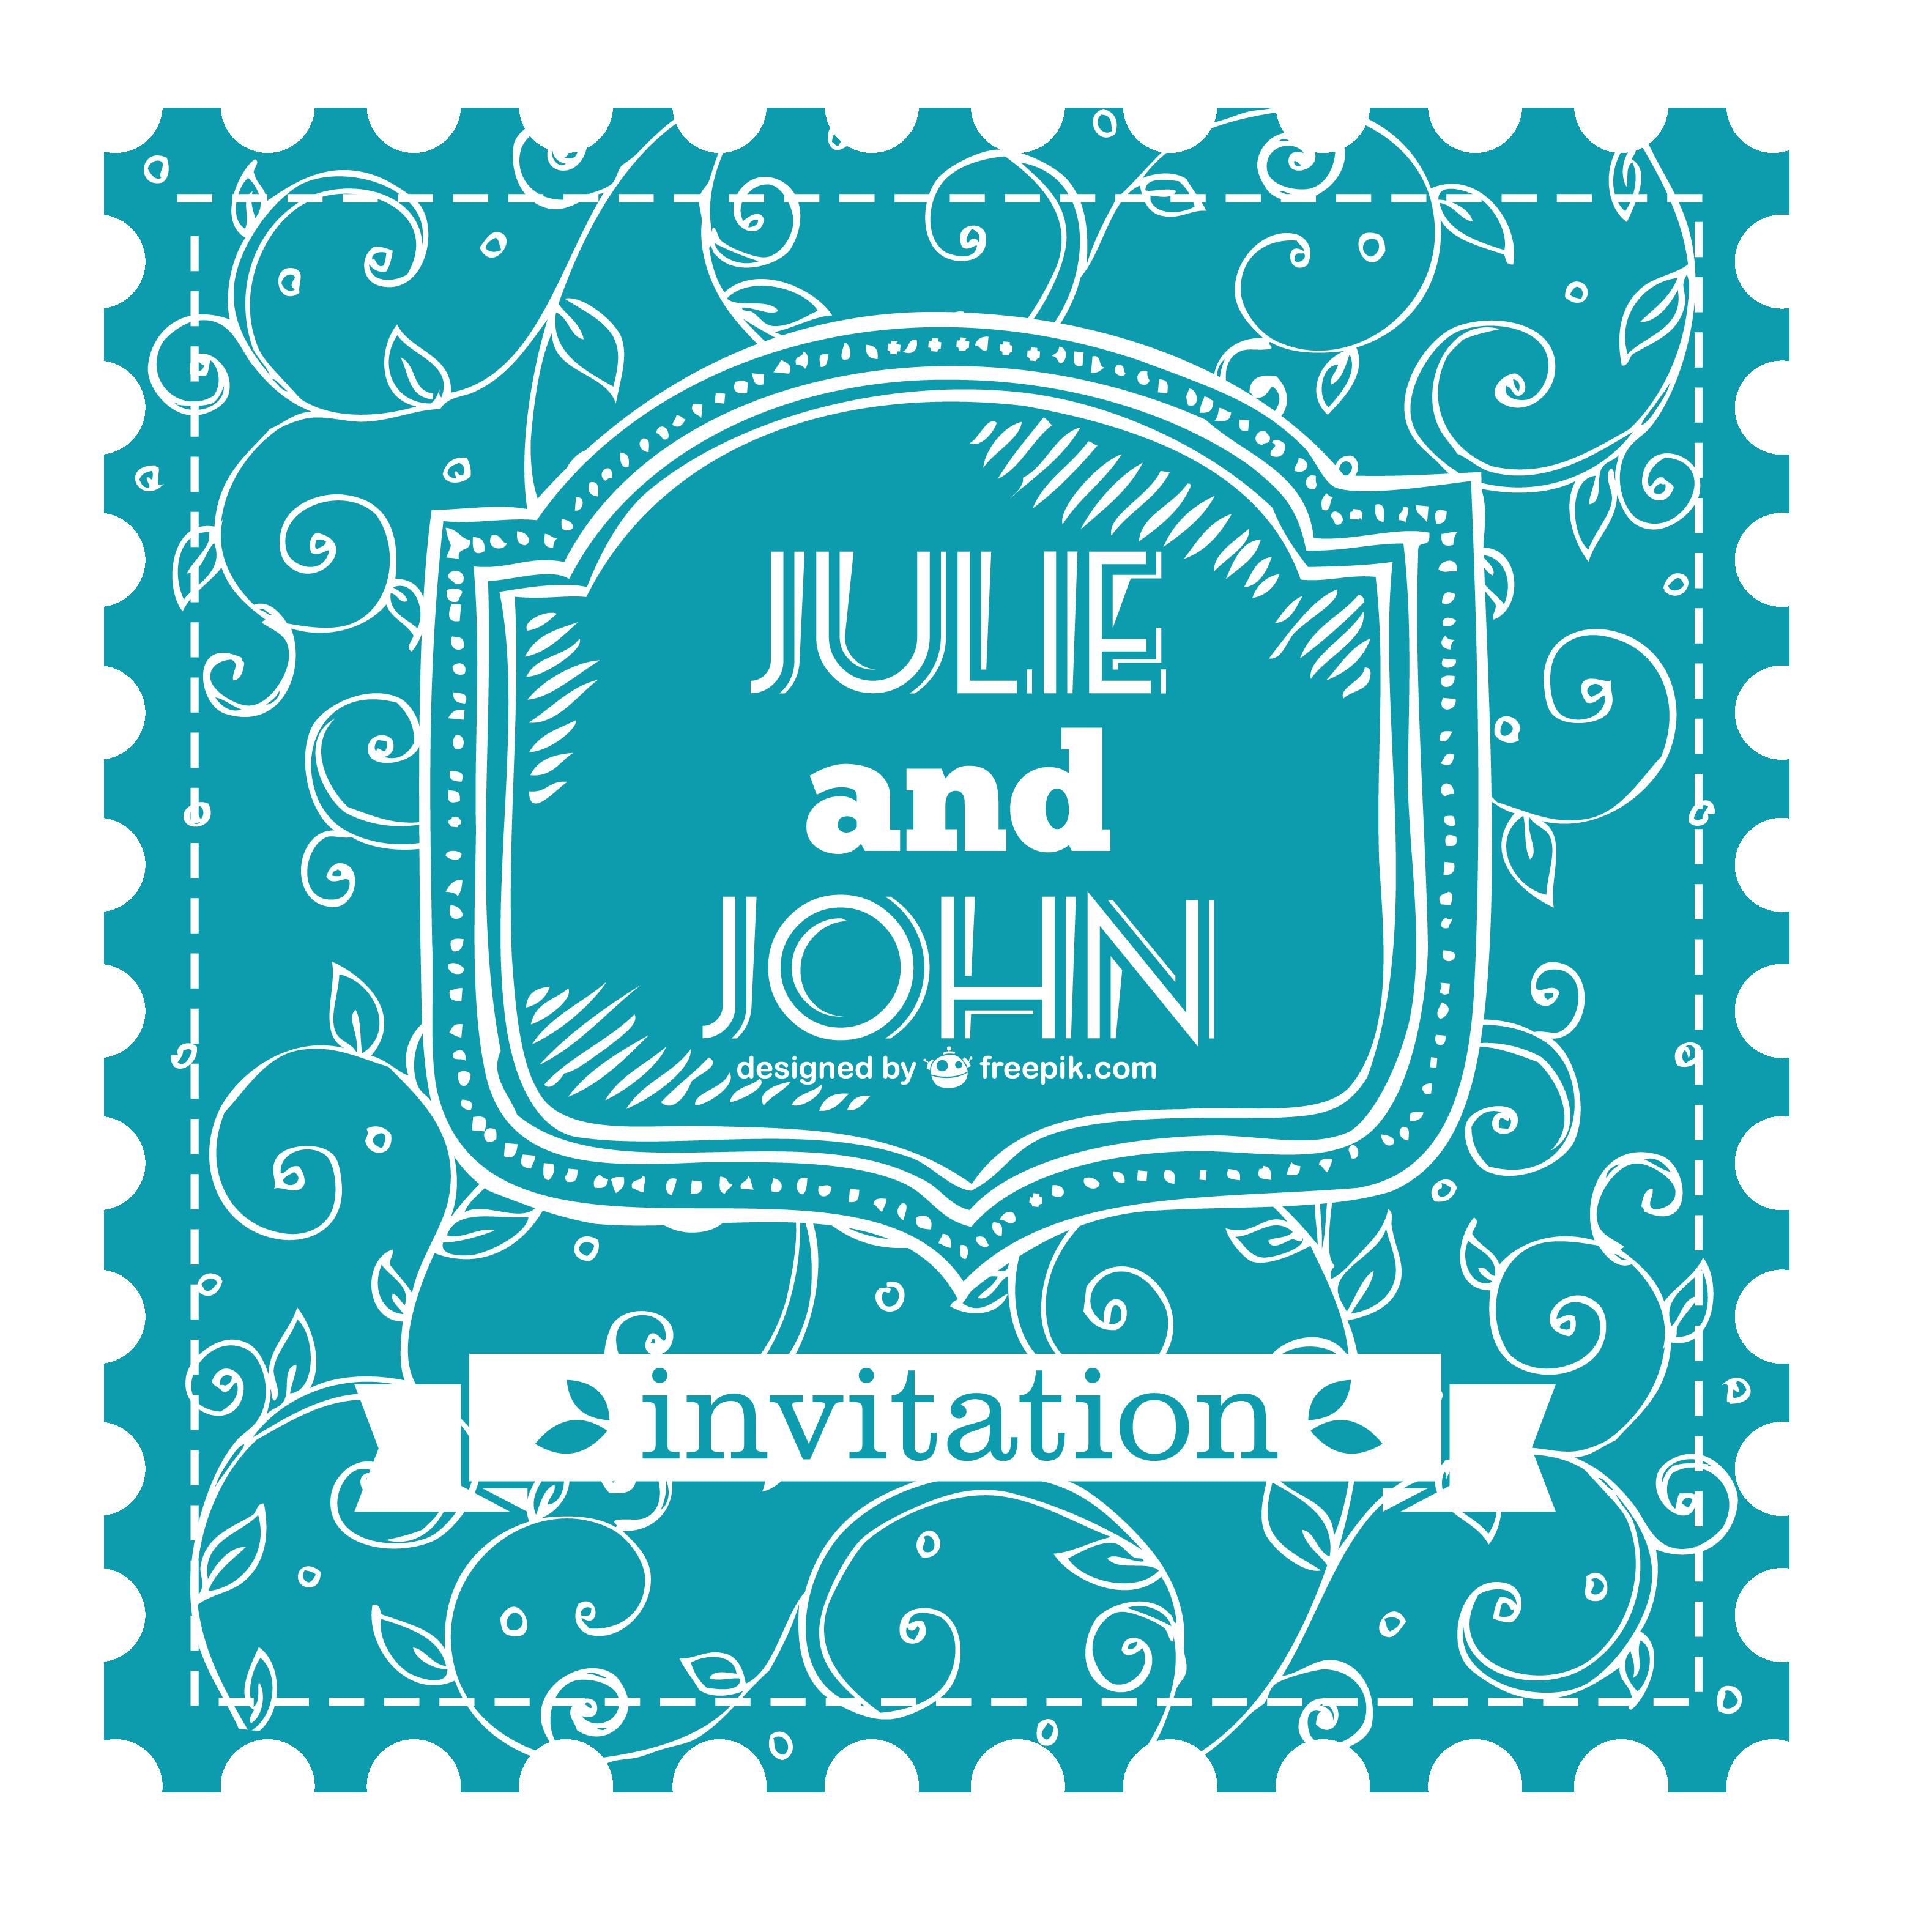 svg download Wedding invitation Vintage clothing Retro style Euclidean vector